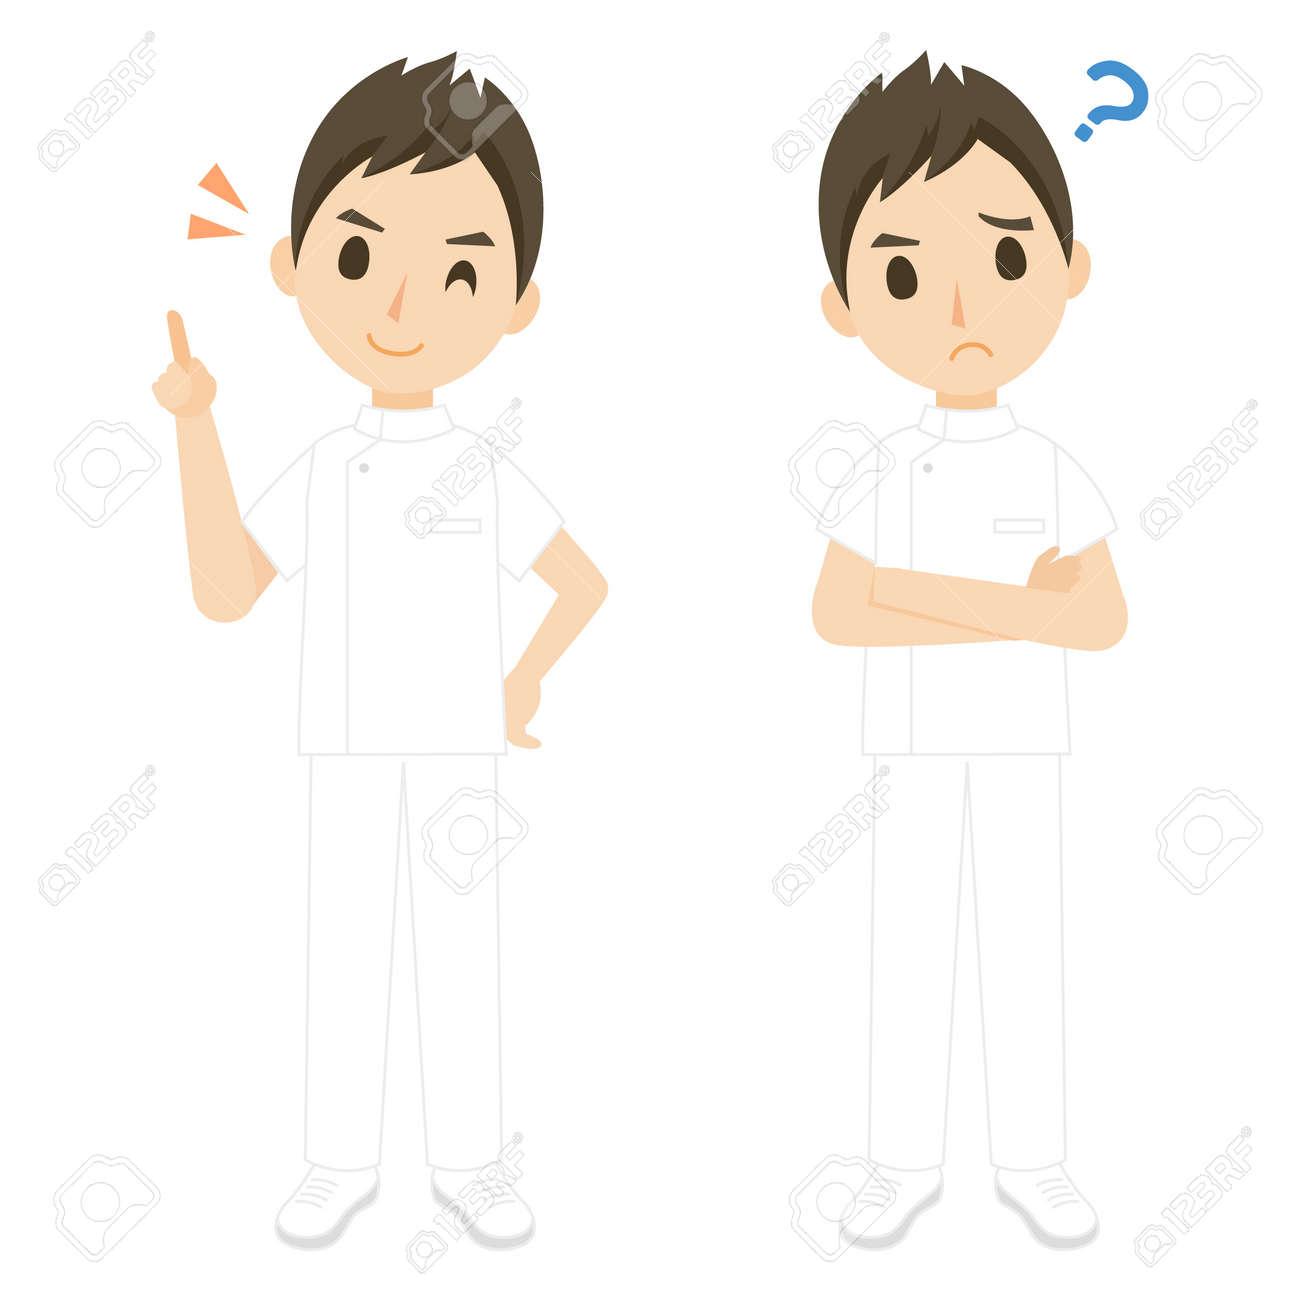 Nurse Male Whole Body Pose Set - 168556839